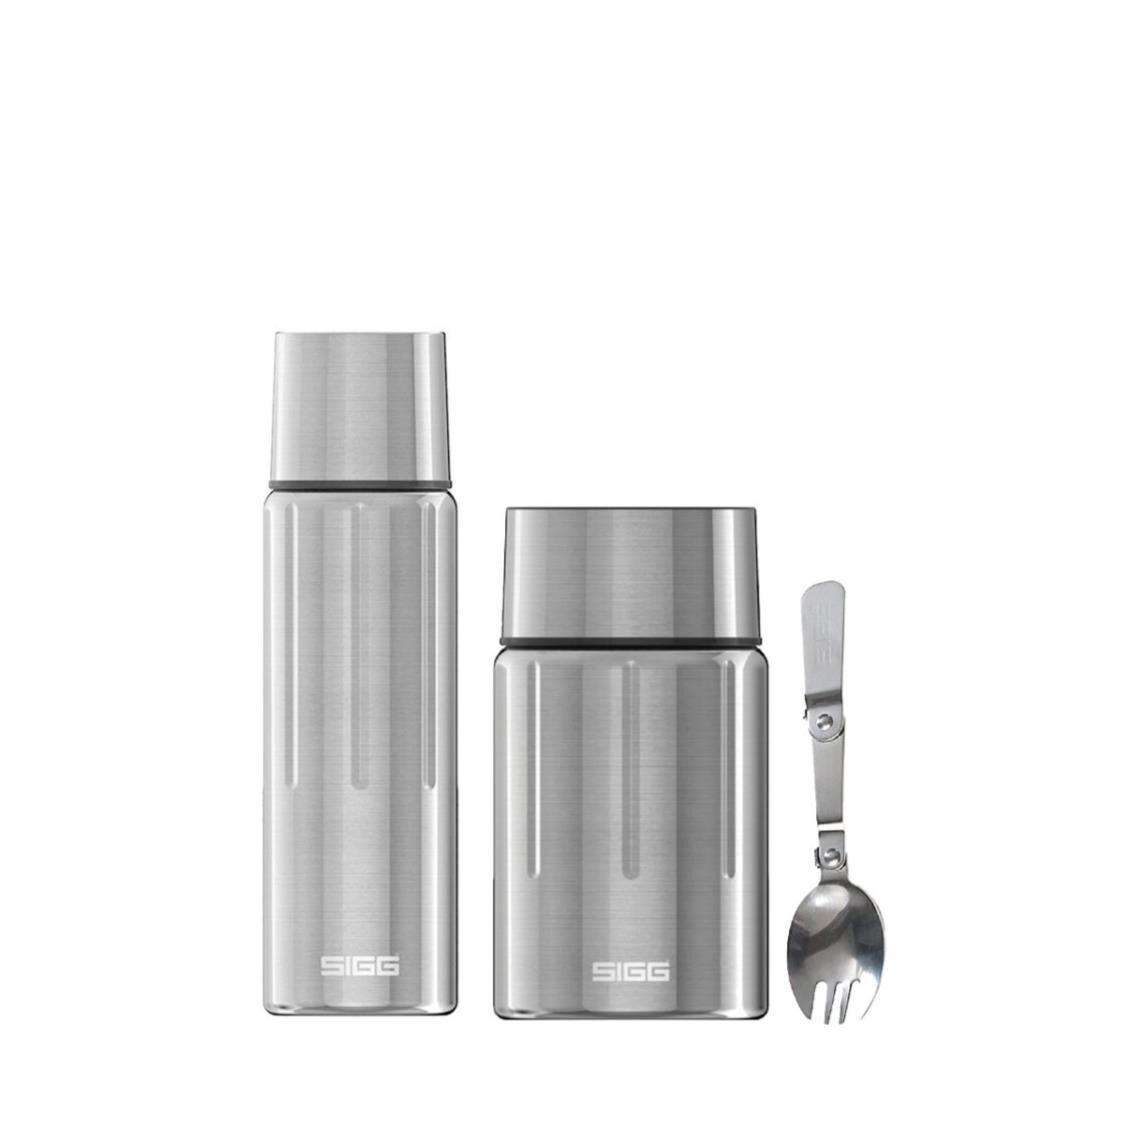 Sigg Bundle - 500ml Food Jar 873550  500ml Bottle Set 873400